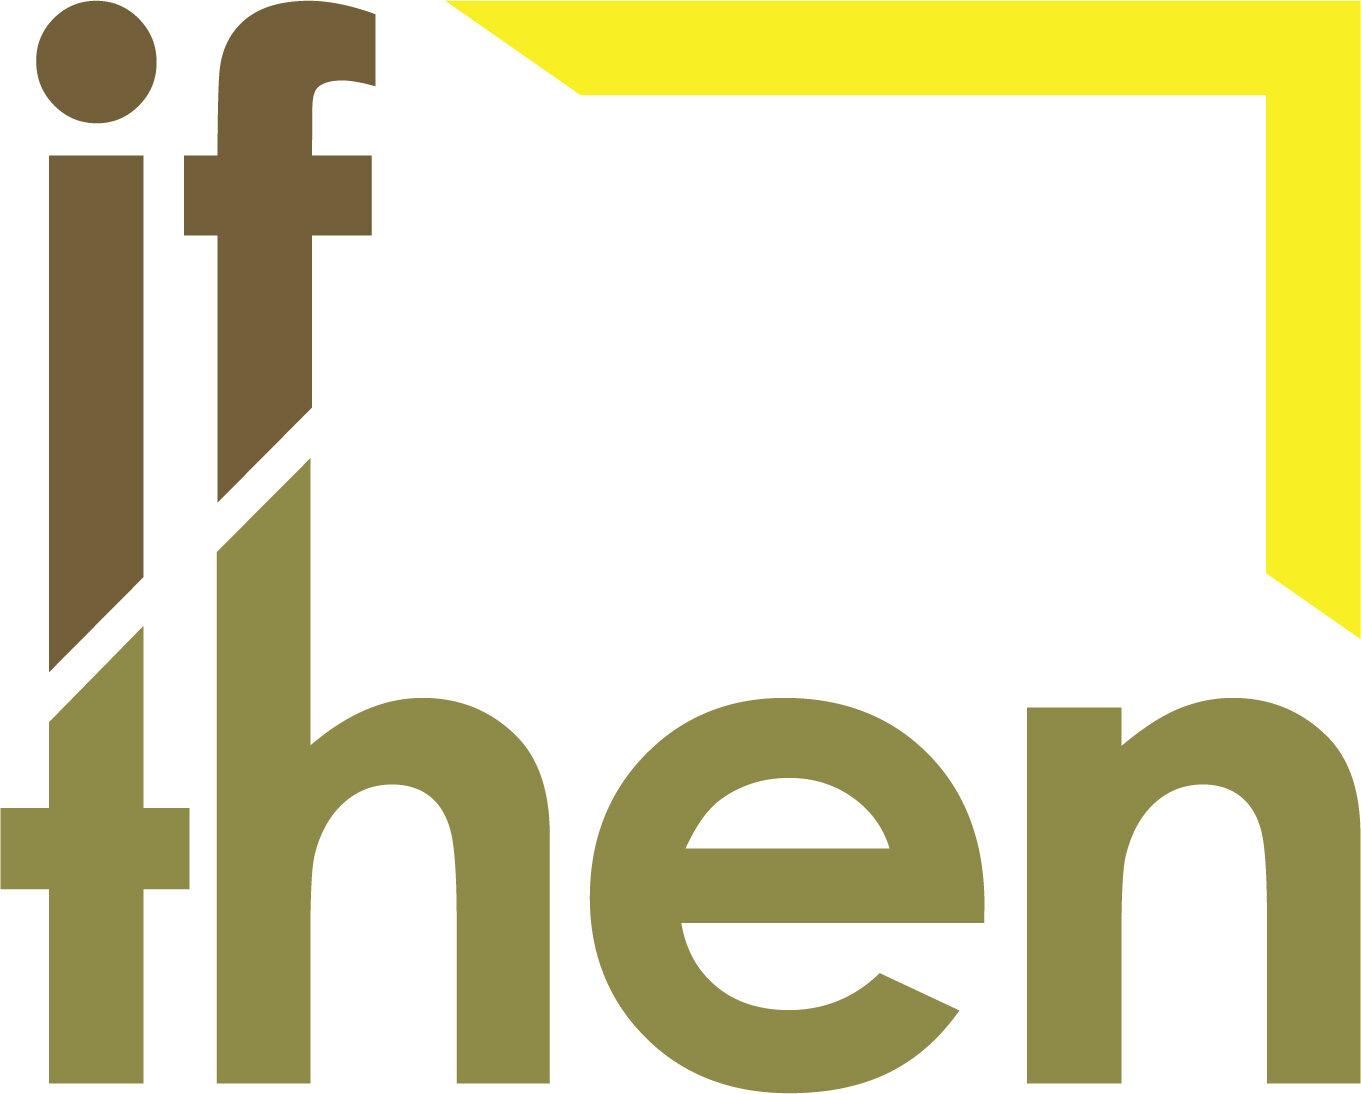 If_Then_Logo_2018_0611.jpg